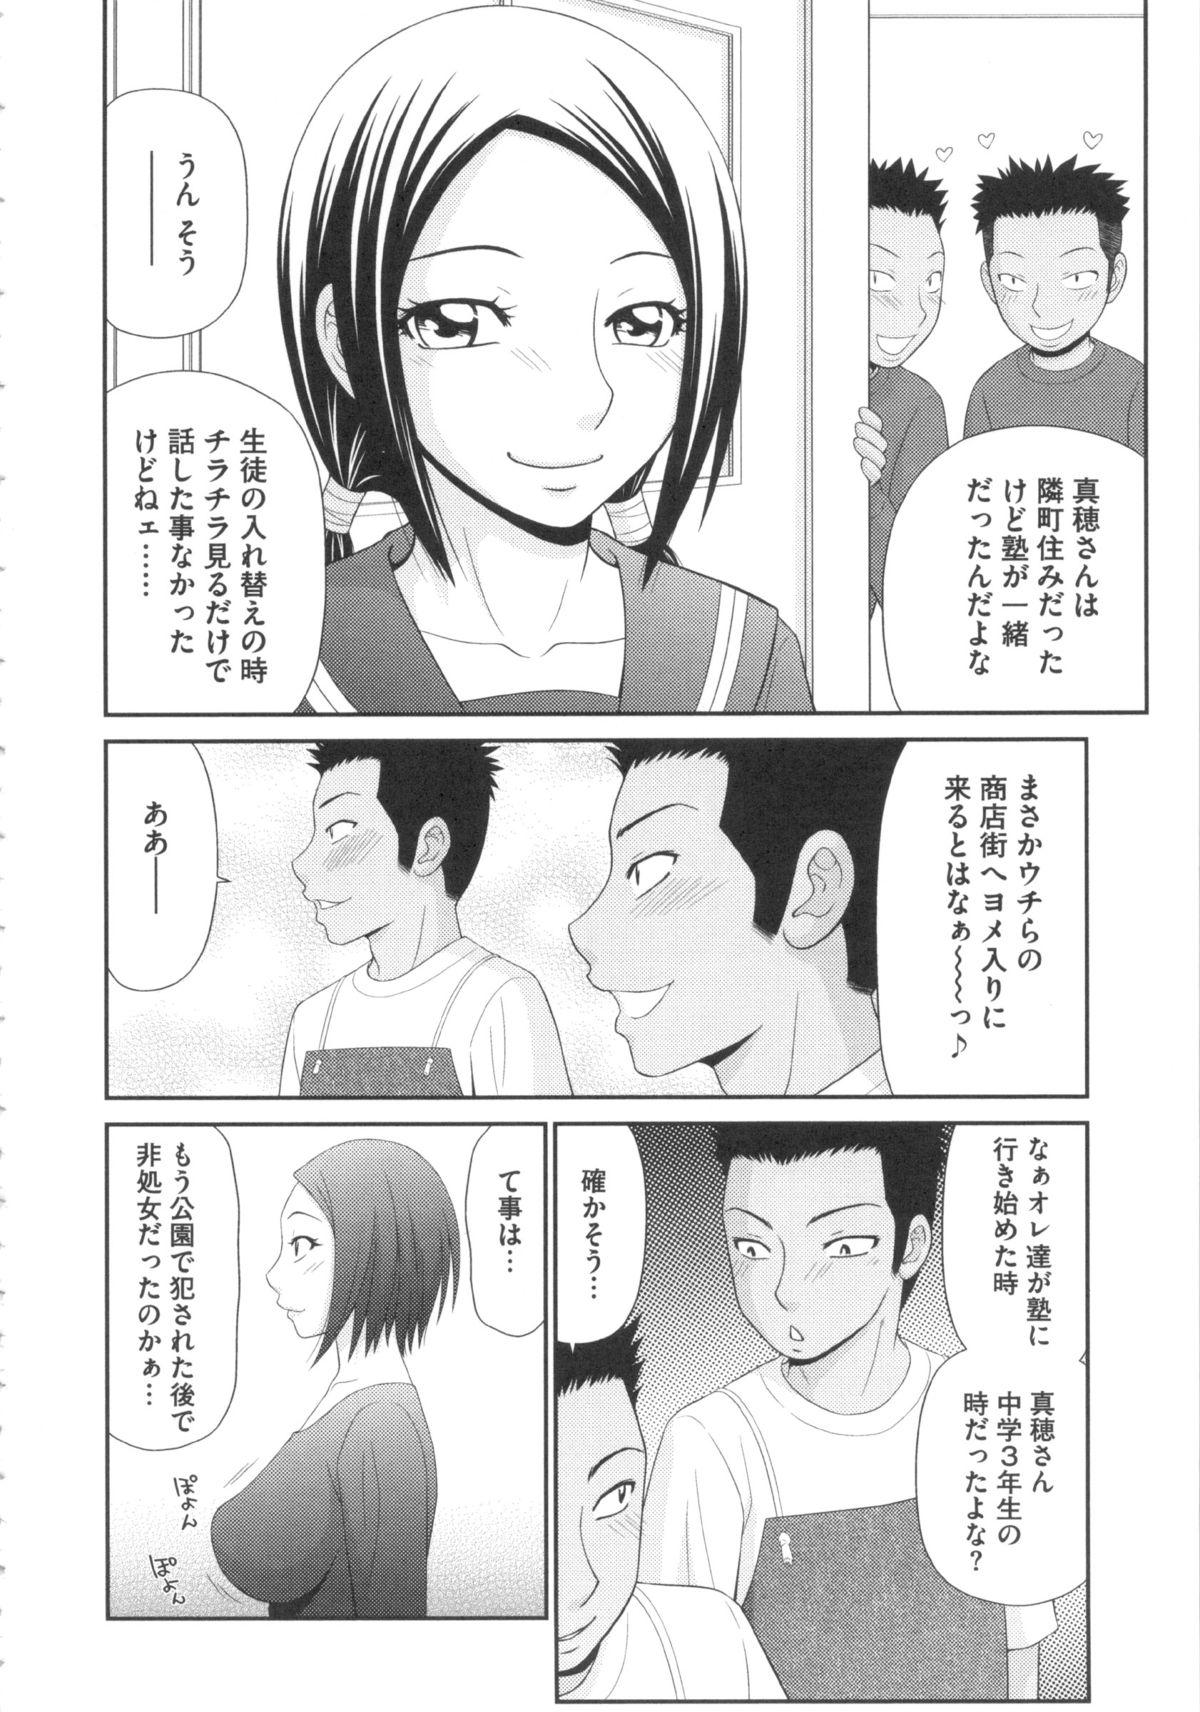 Kiseki No Zaajiru - Sperm of Miracle 146